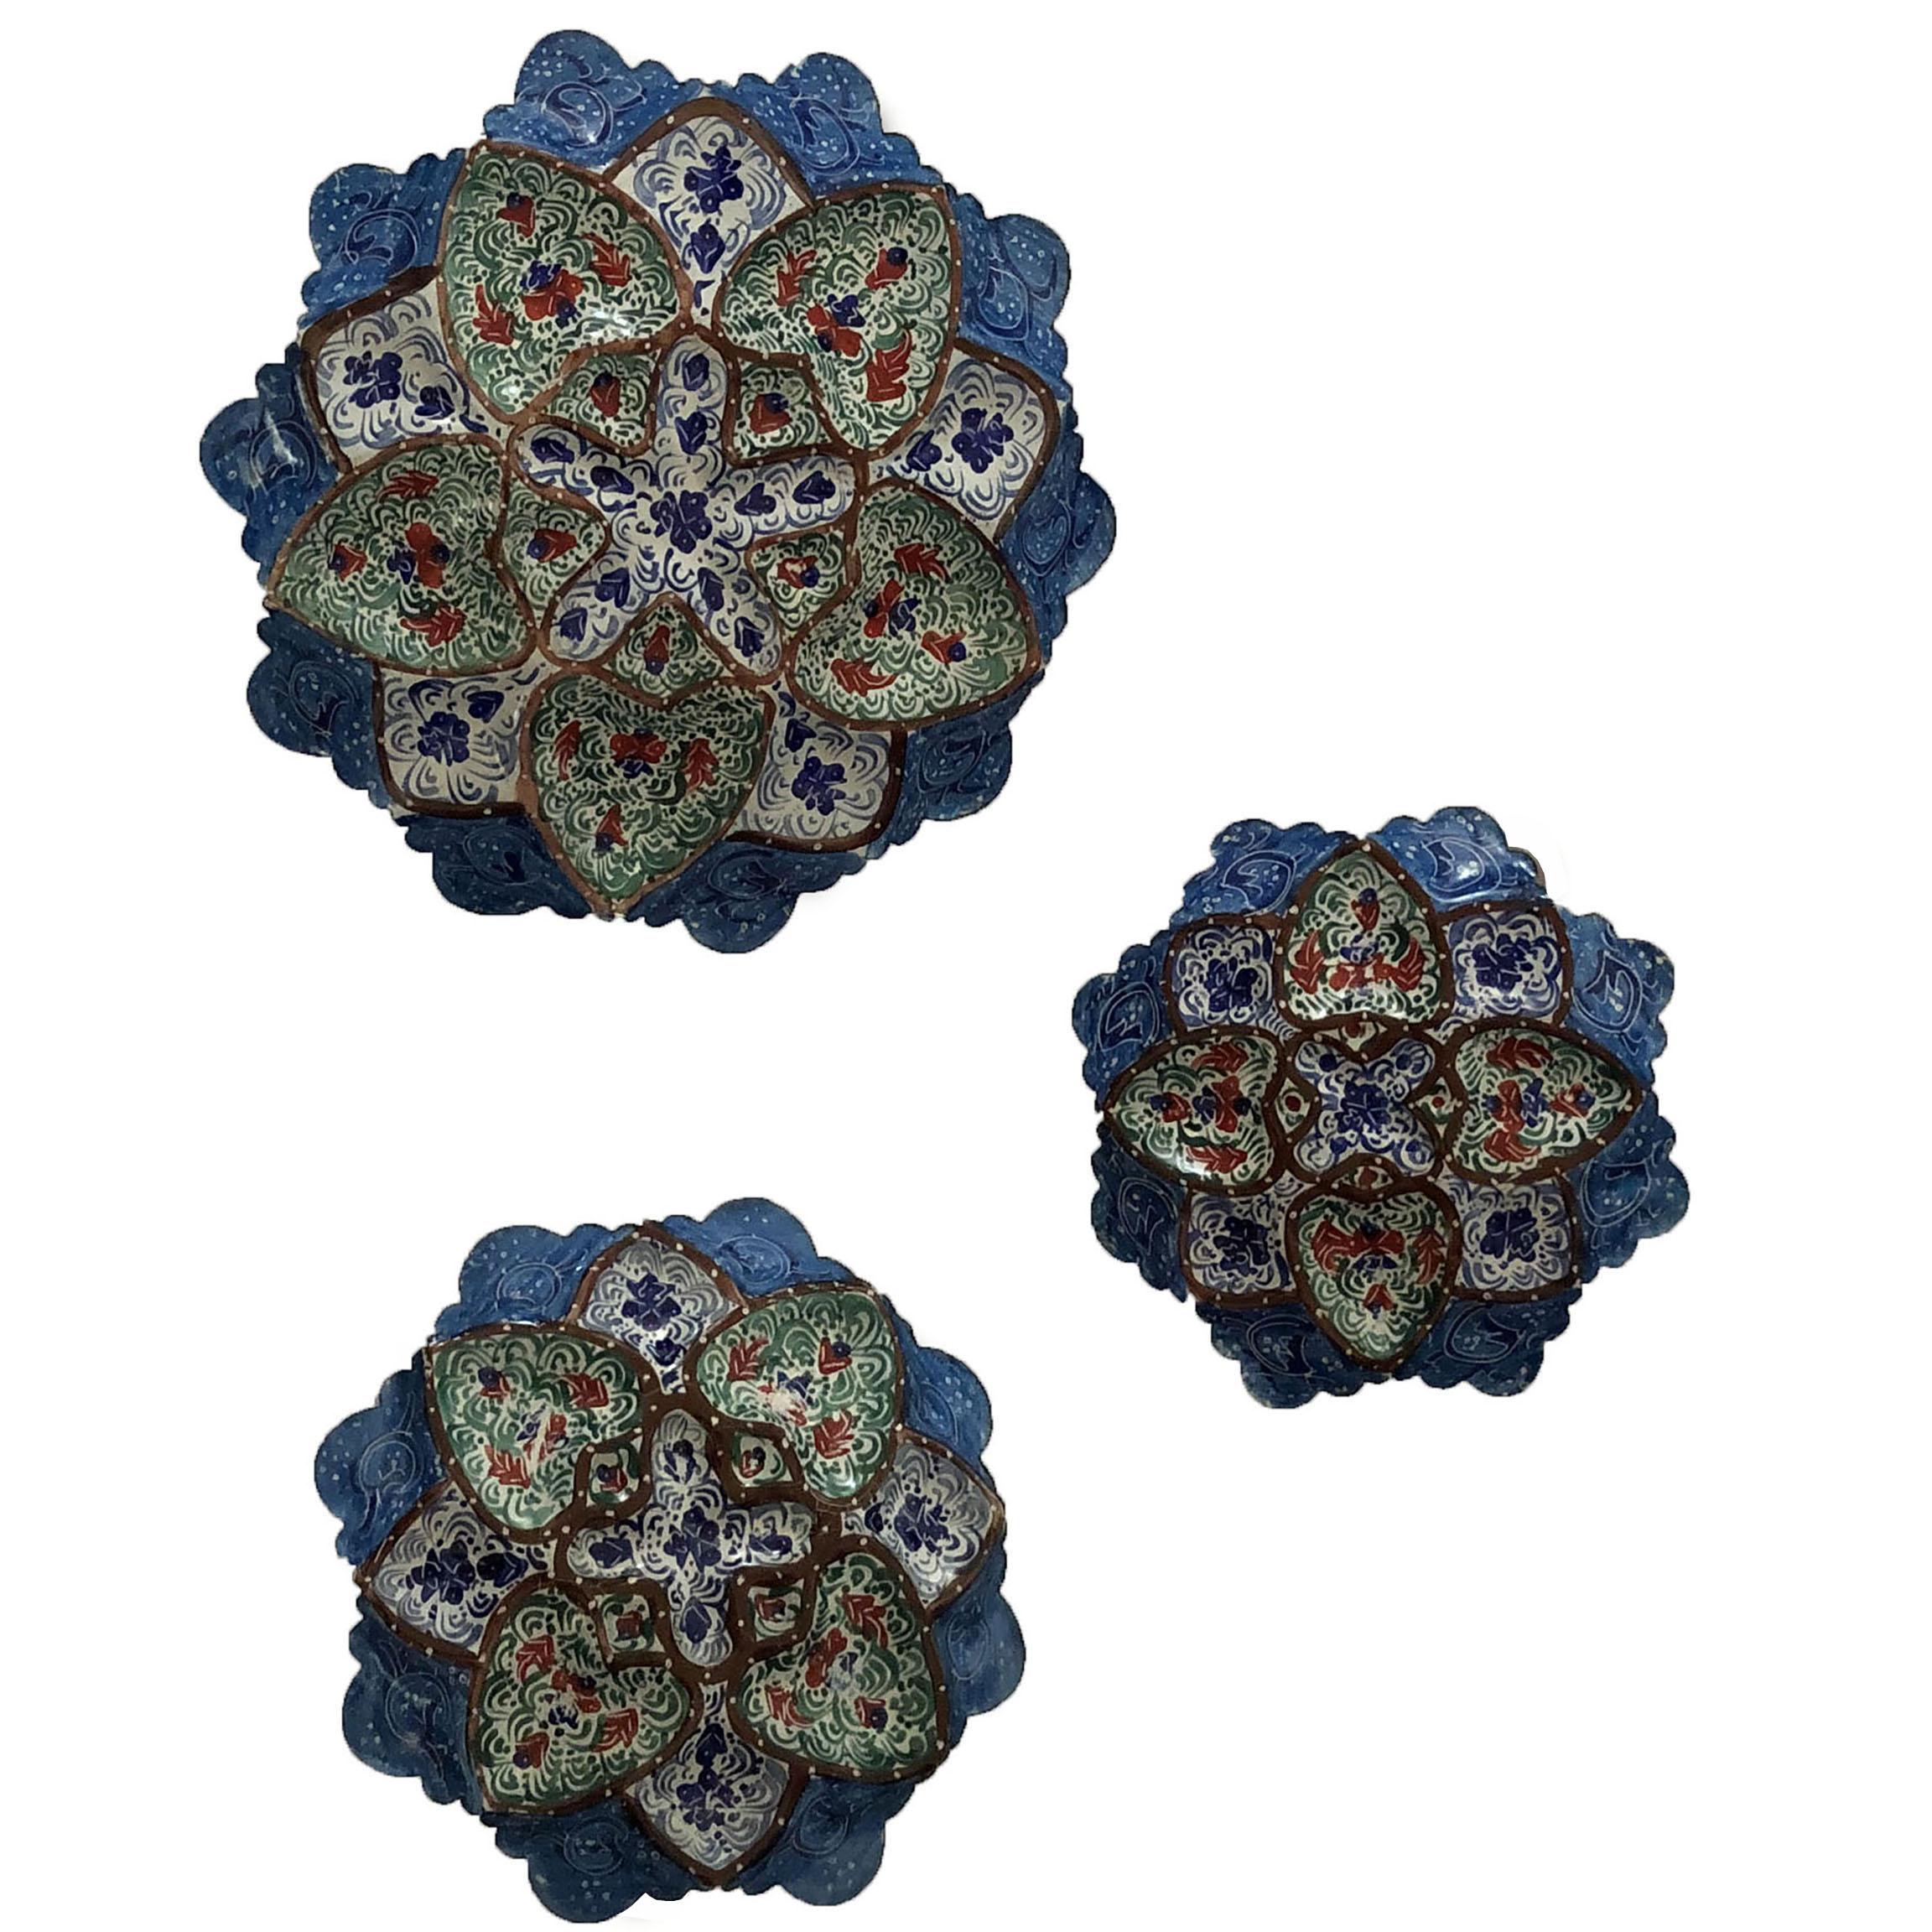 عکس بشقاب میناکاری مسی مدل m012 مجموعه سه عددی